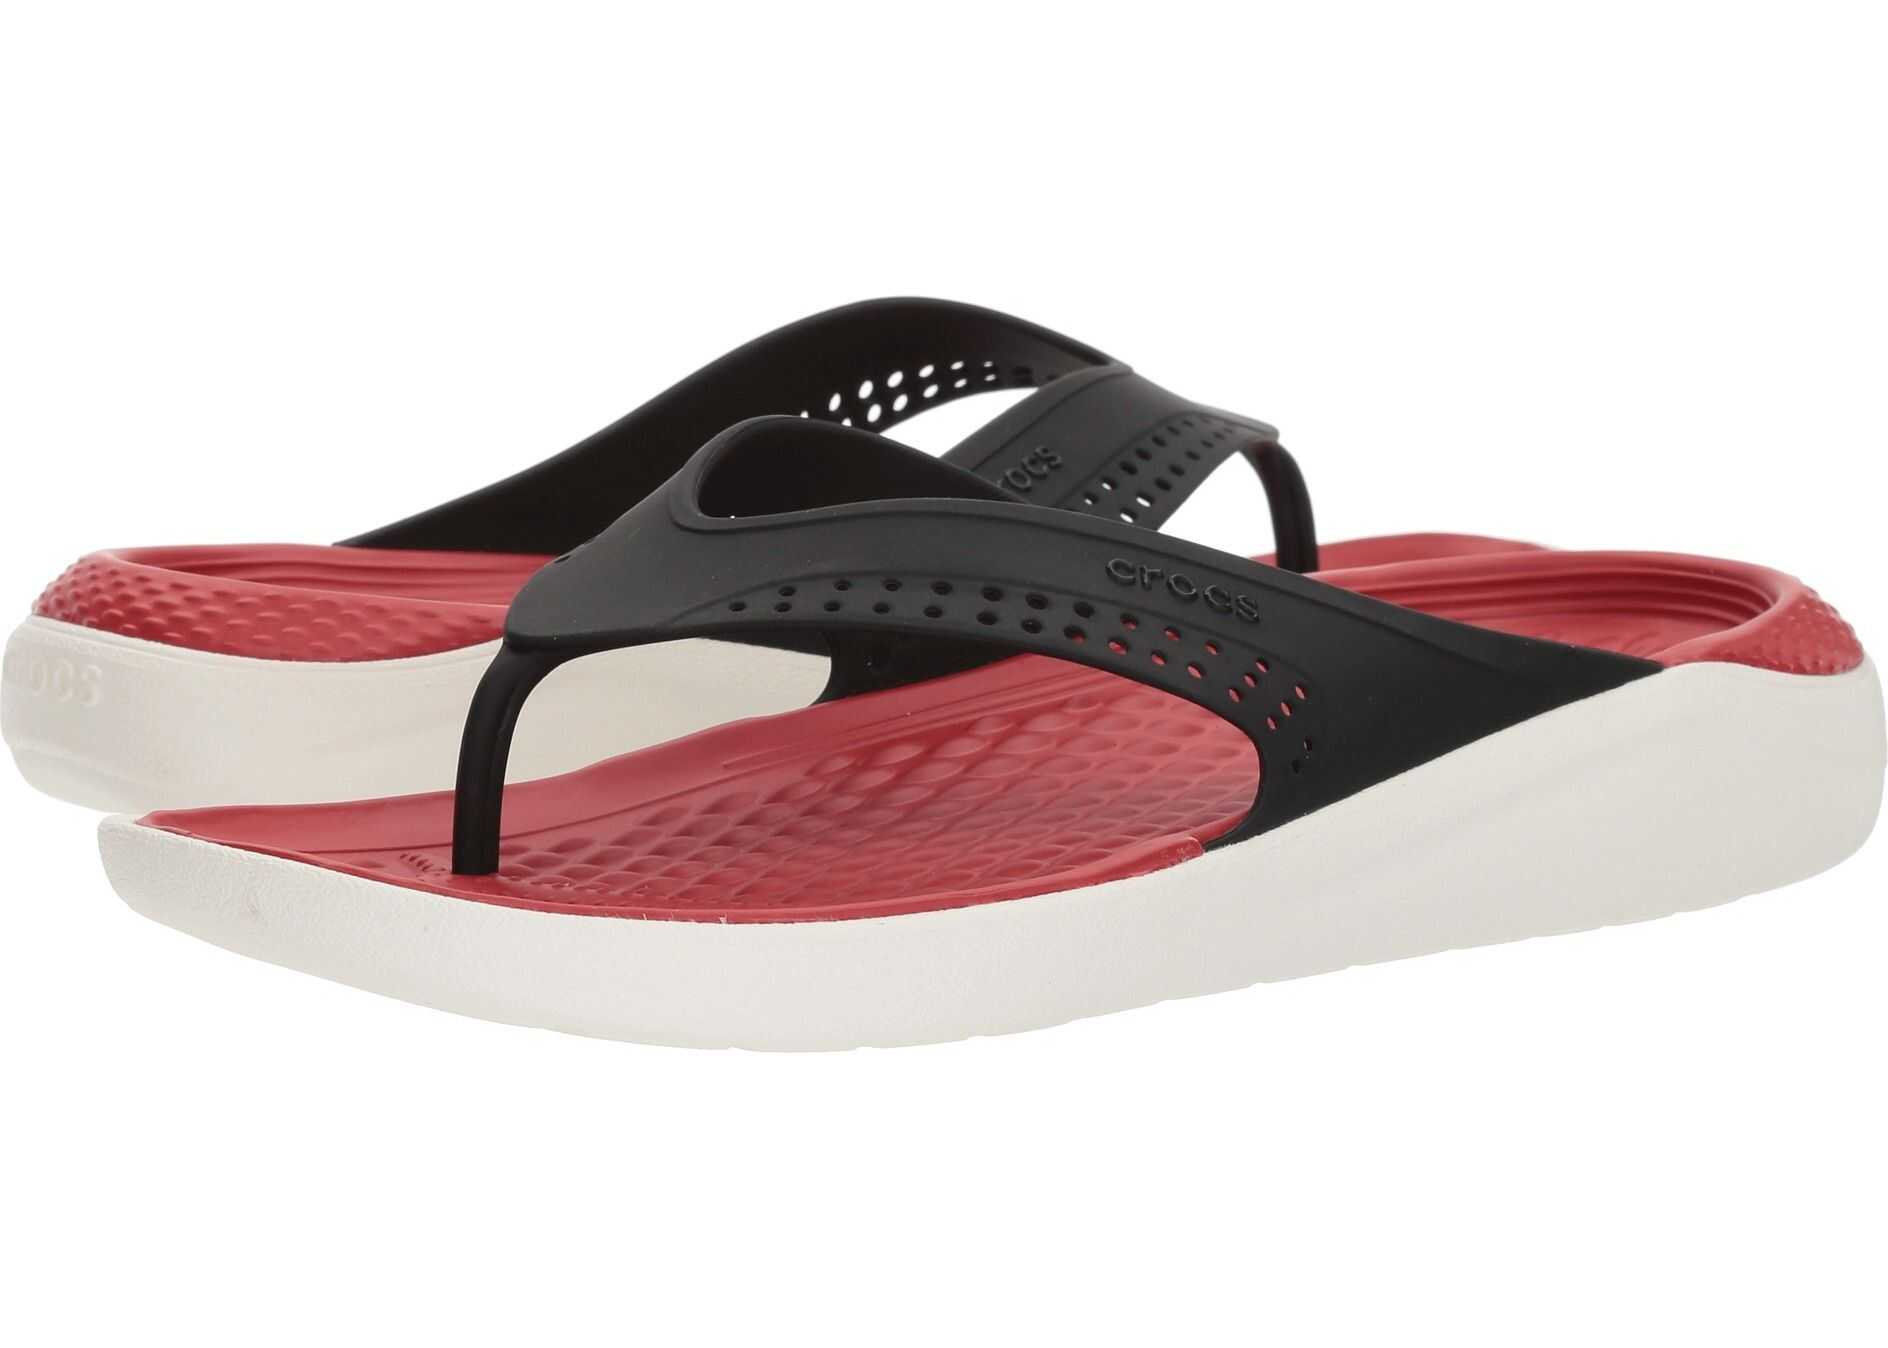 Crocs LiteRide Flip Black/White